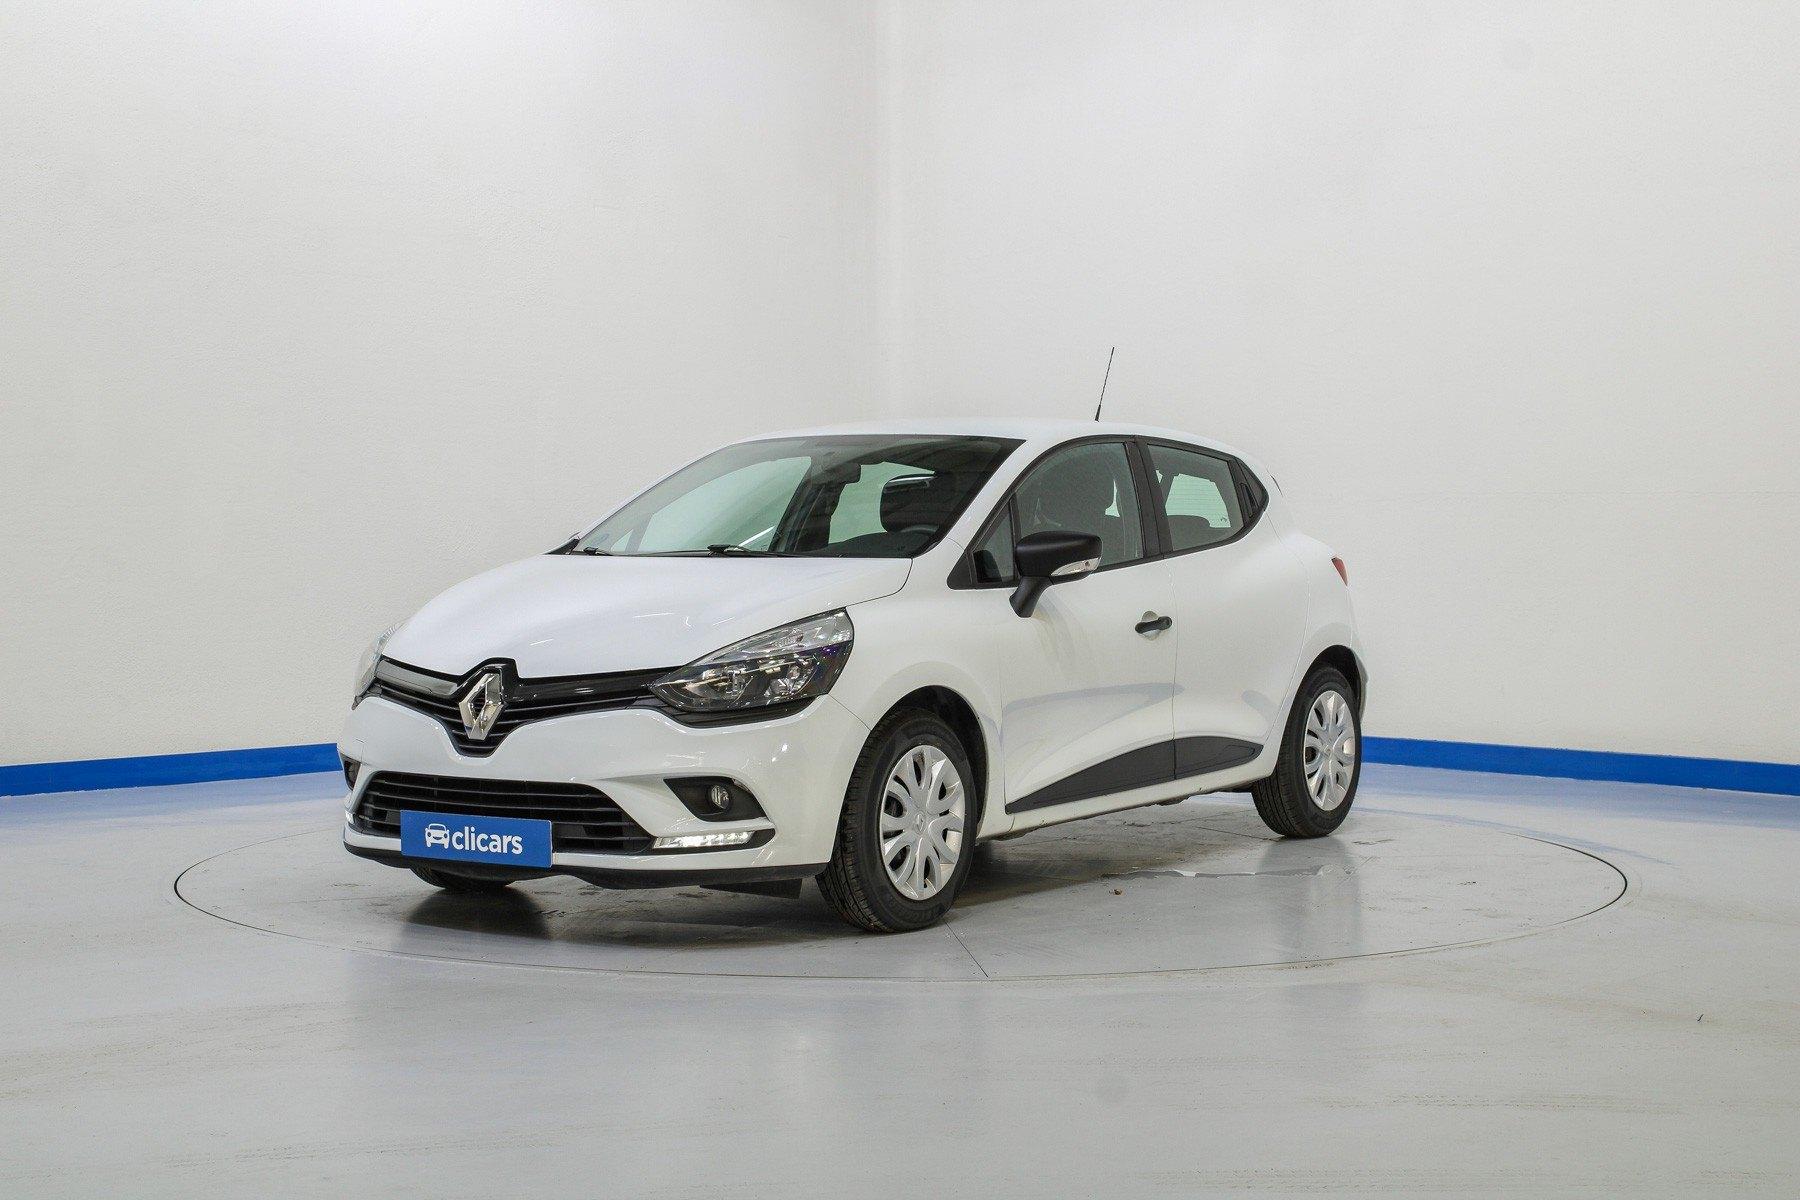 Renault Clio Gas licuado Business TCe 66kW (90CV) GLP -18 1